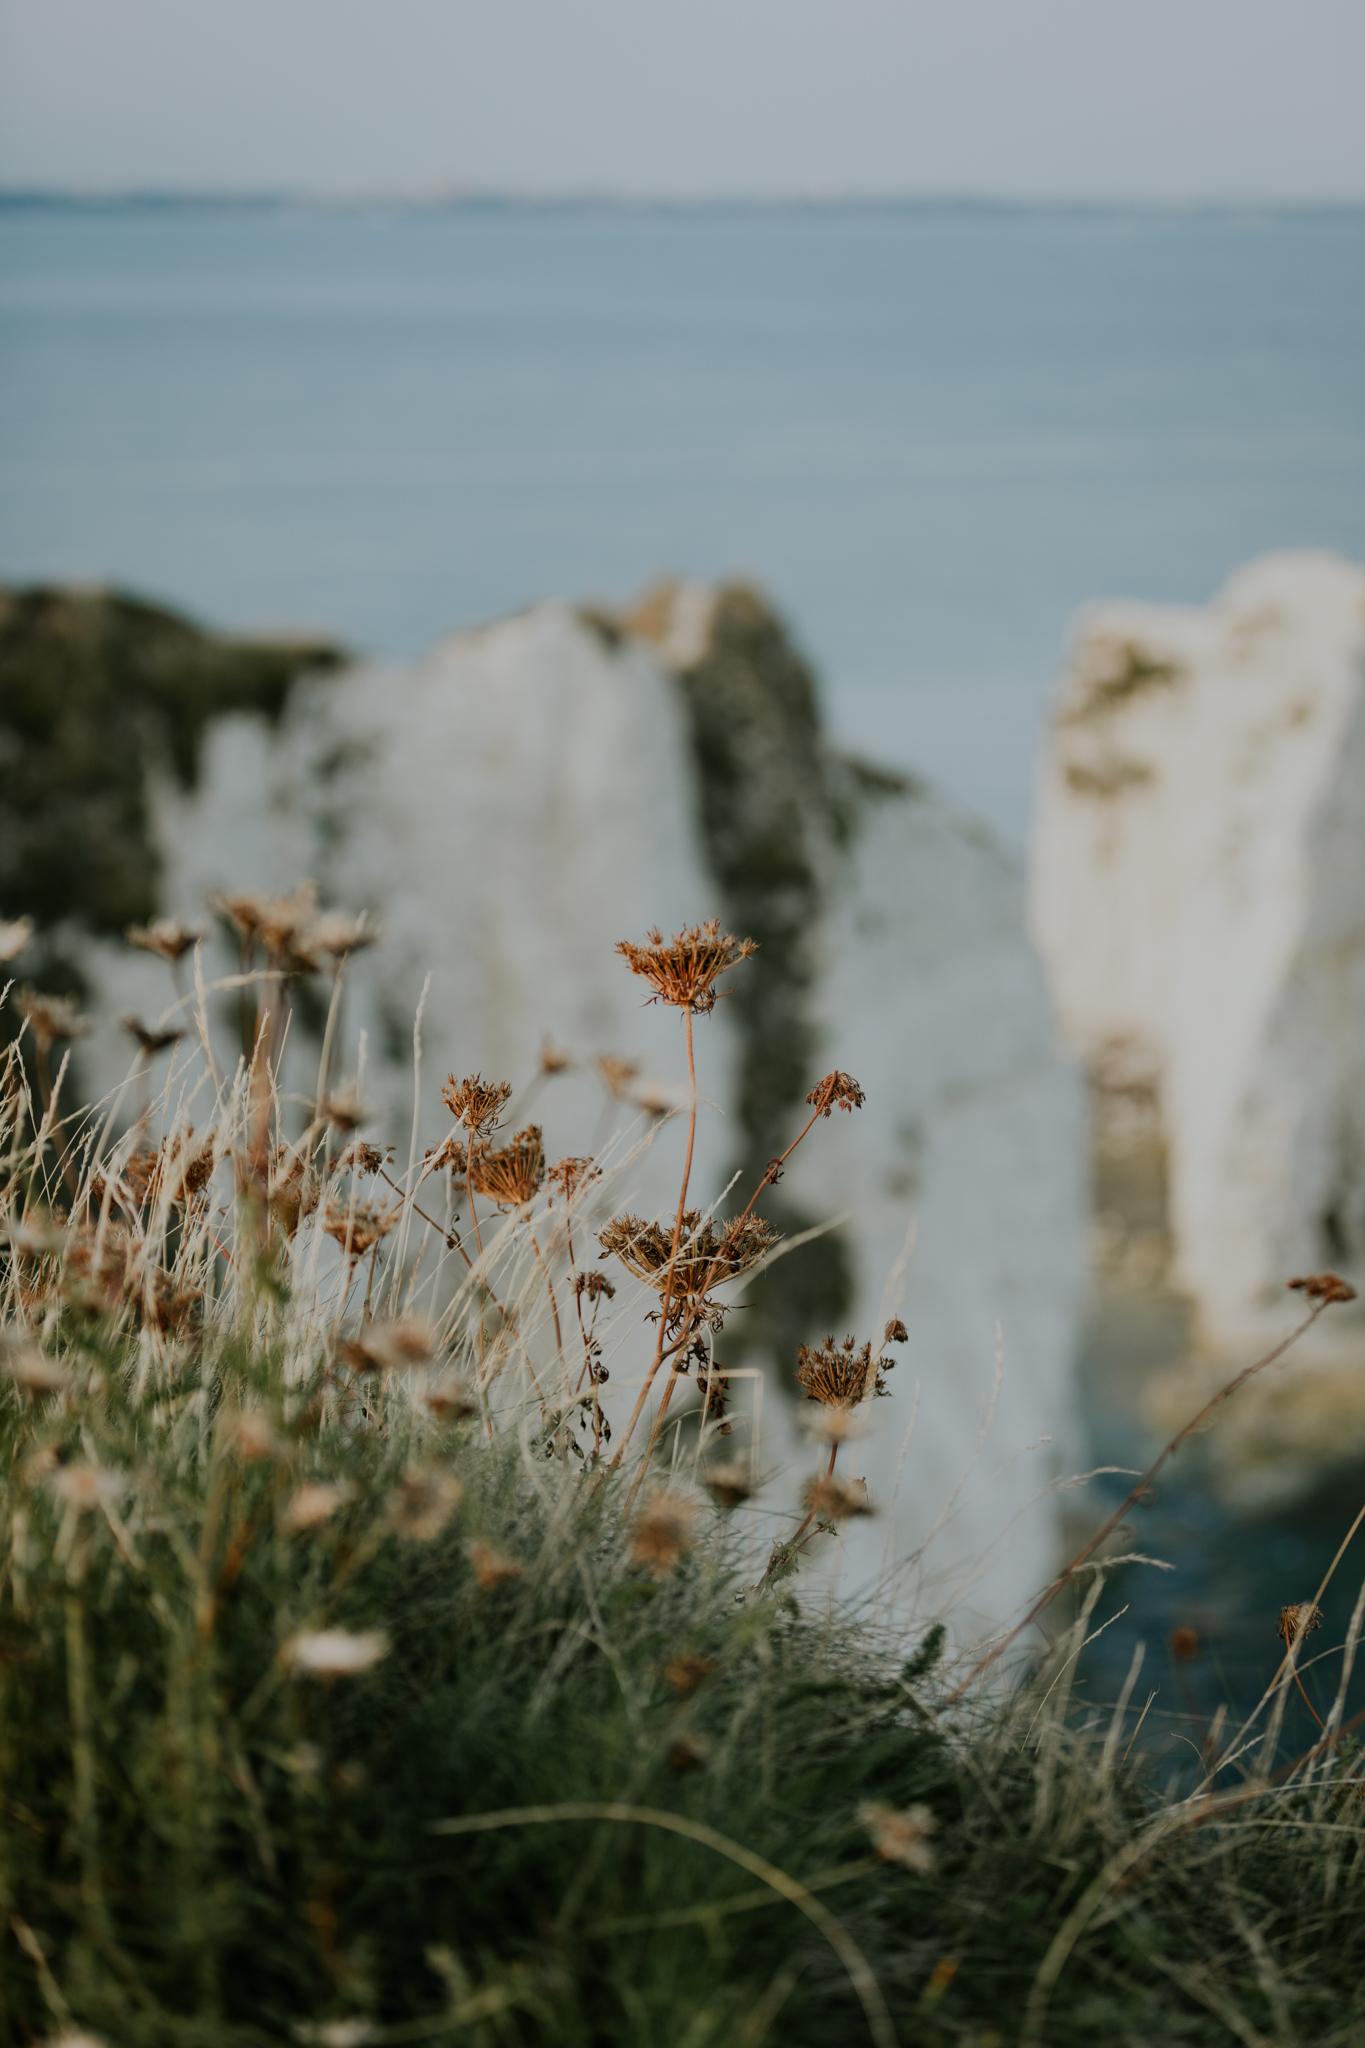 Natalie Skoric - England Travel Photography (123).jpg